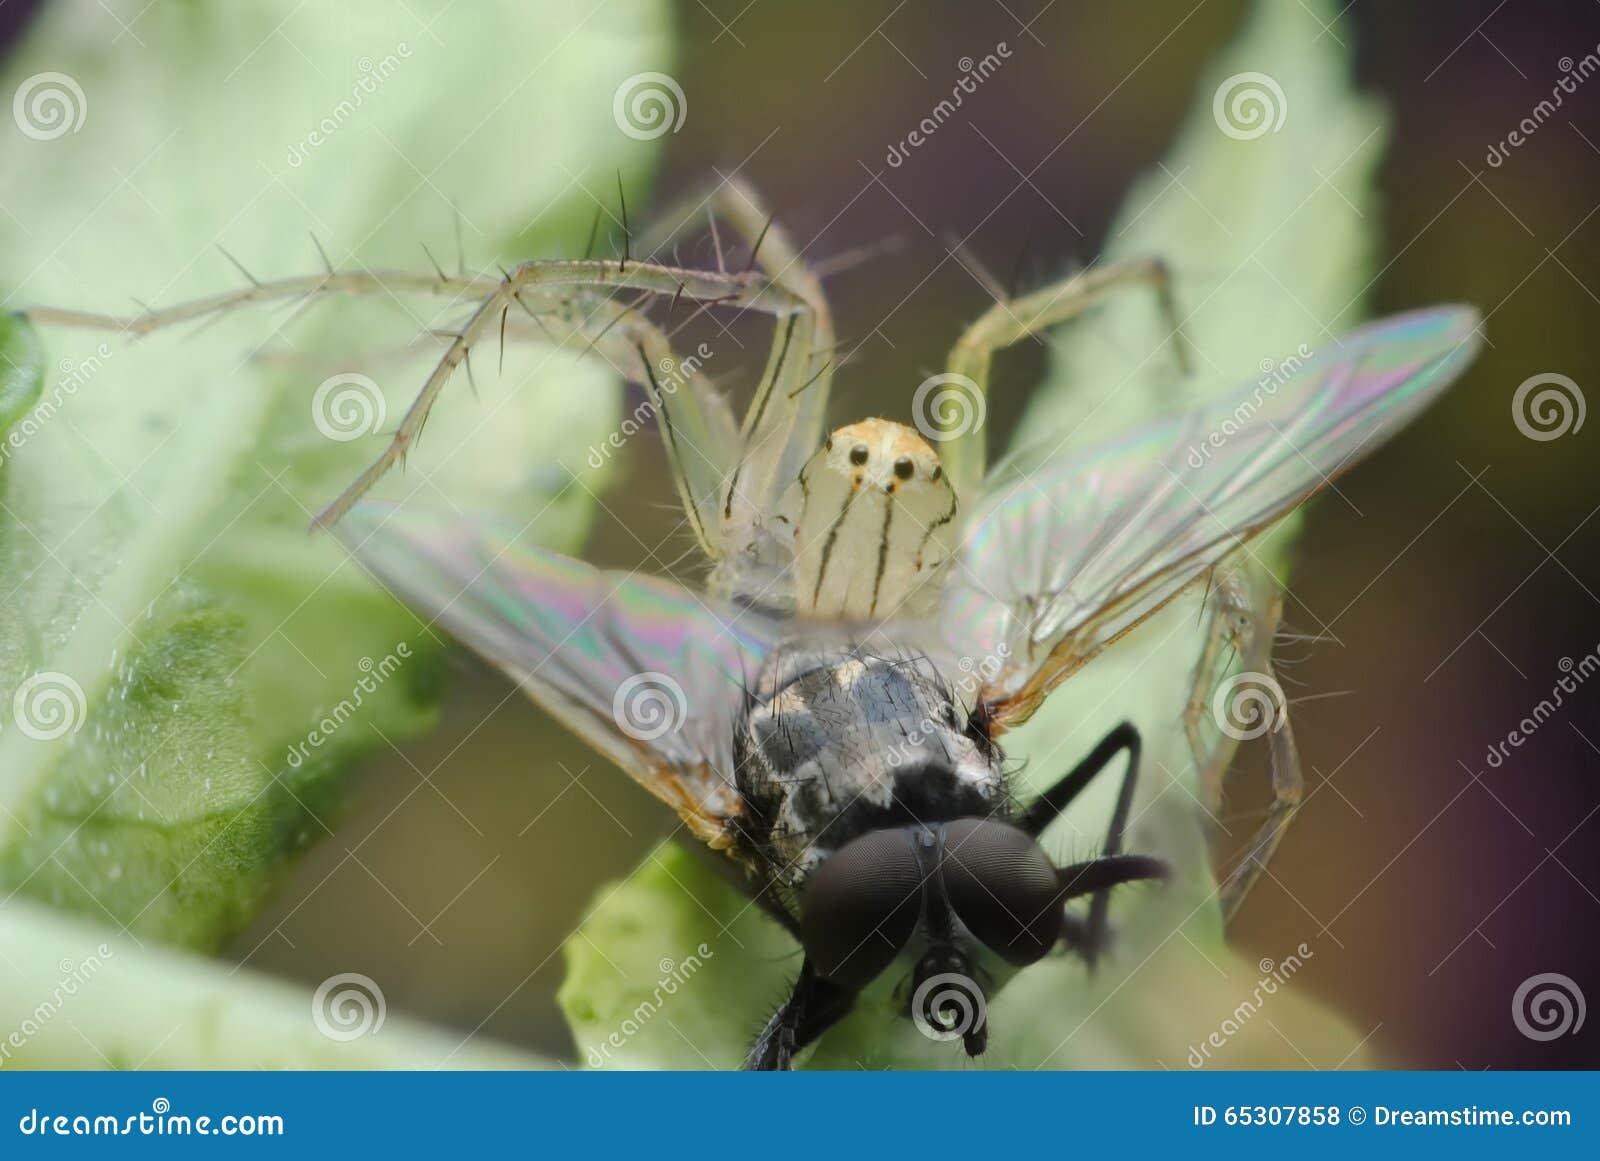 Die Spinne, die Fangfliege ist, essen